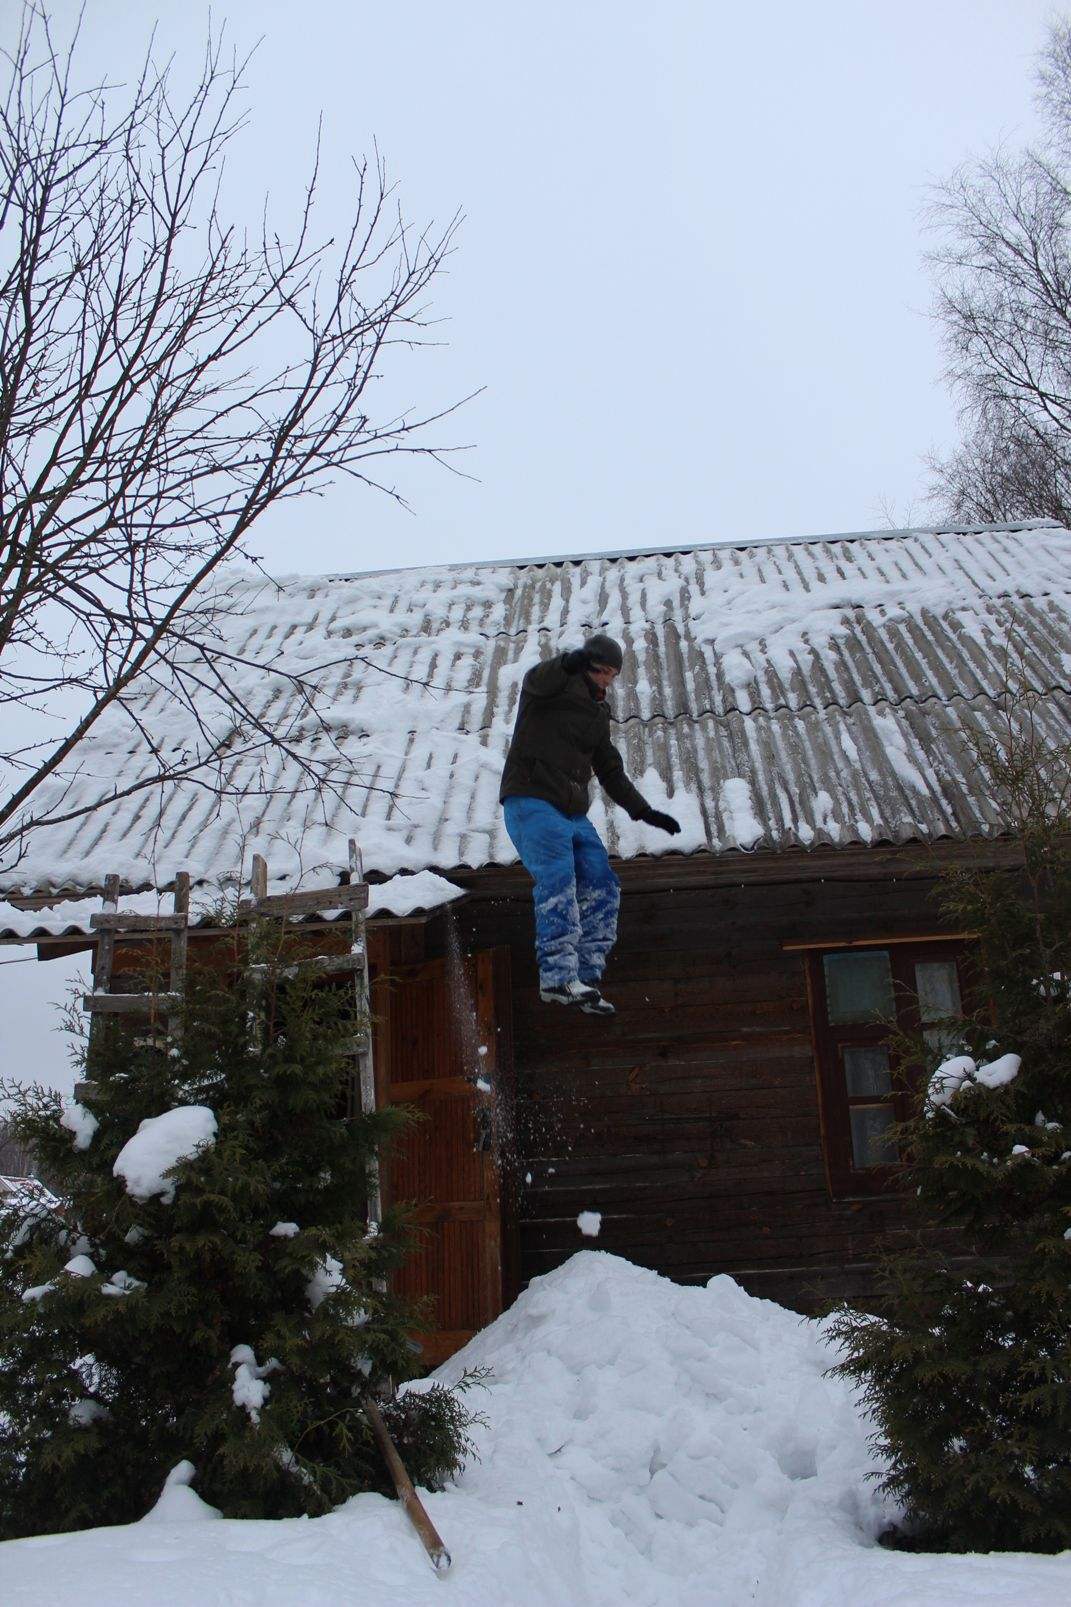 ccЛюди зимой1 (4).jpg